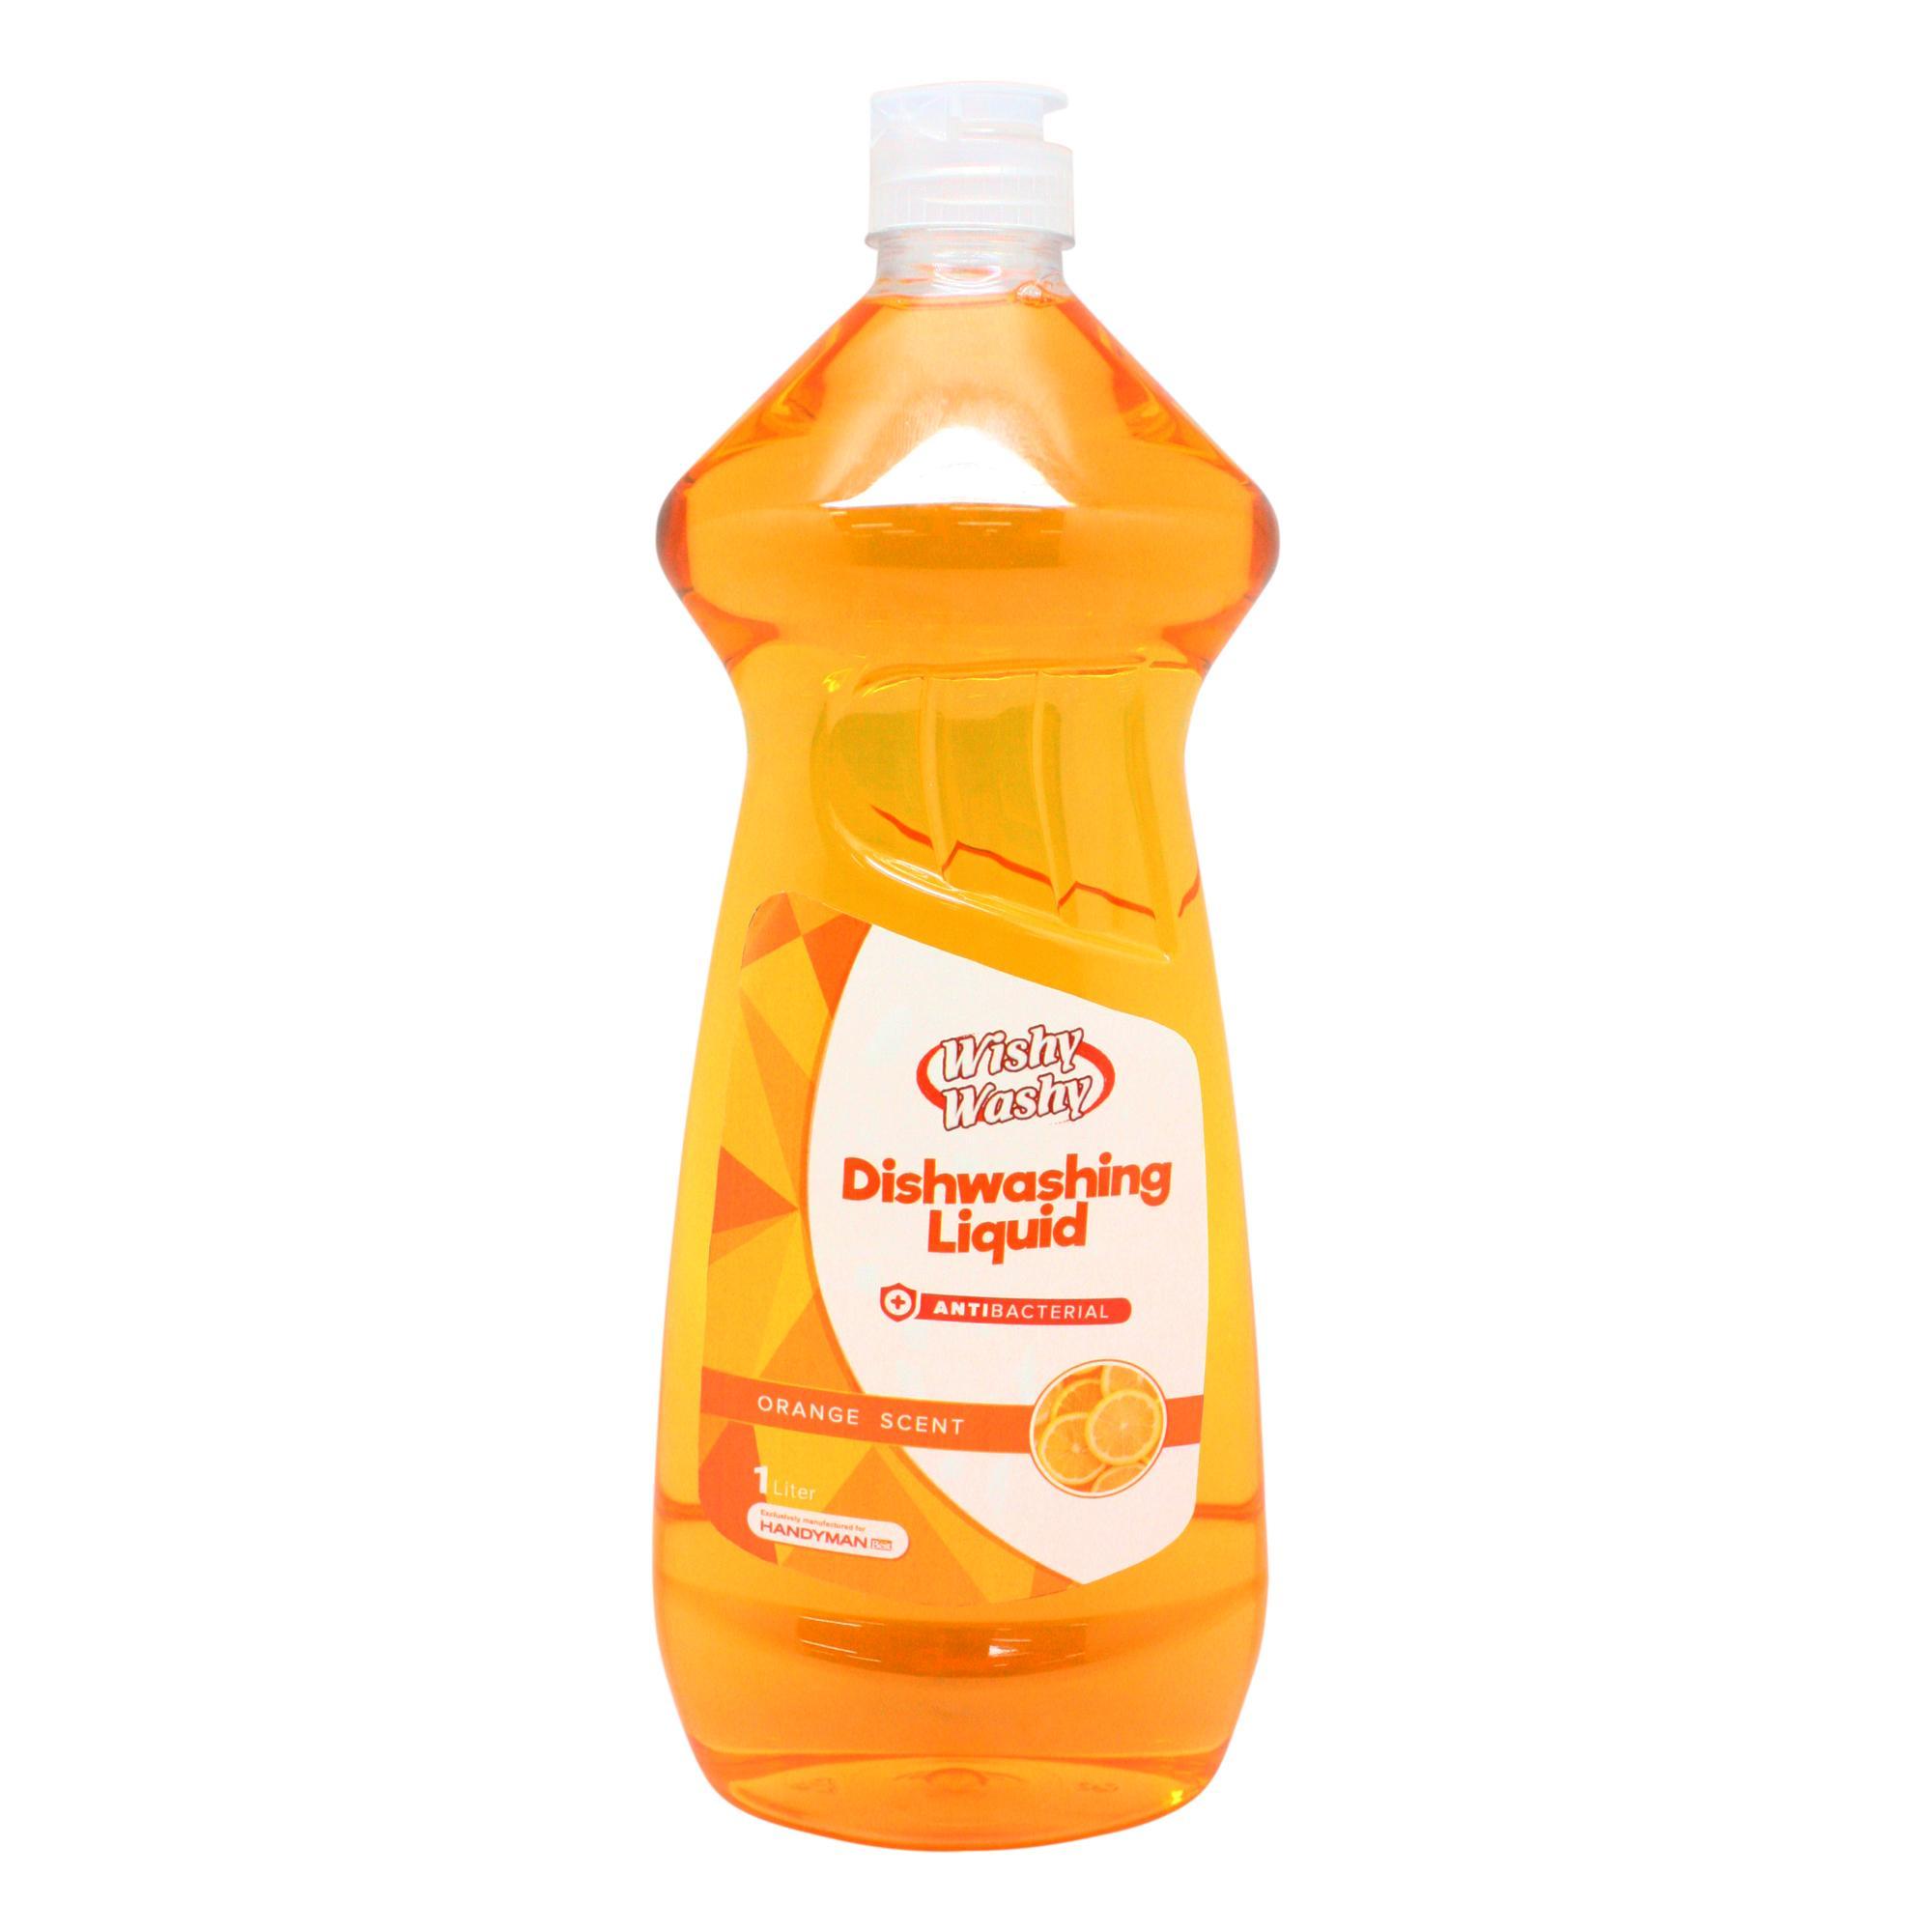 Wishy Washy Antibacterial Dishwashing Liquid With Orange Scent 1l By Handyman.